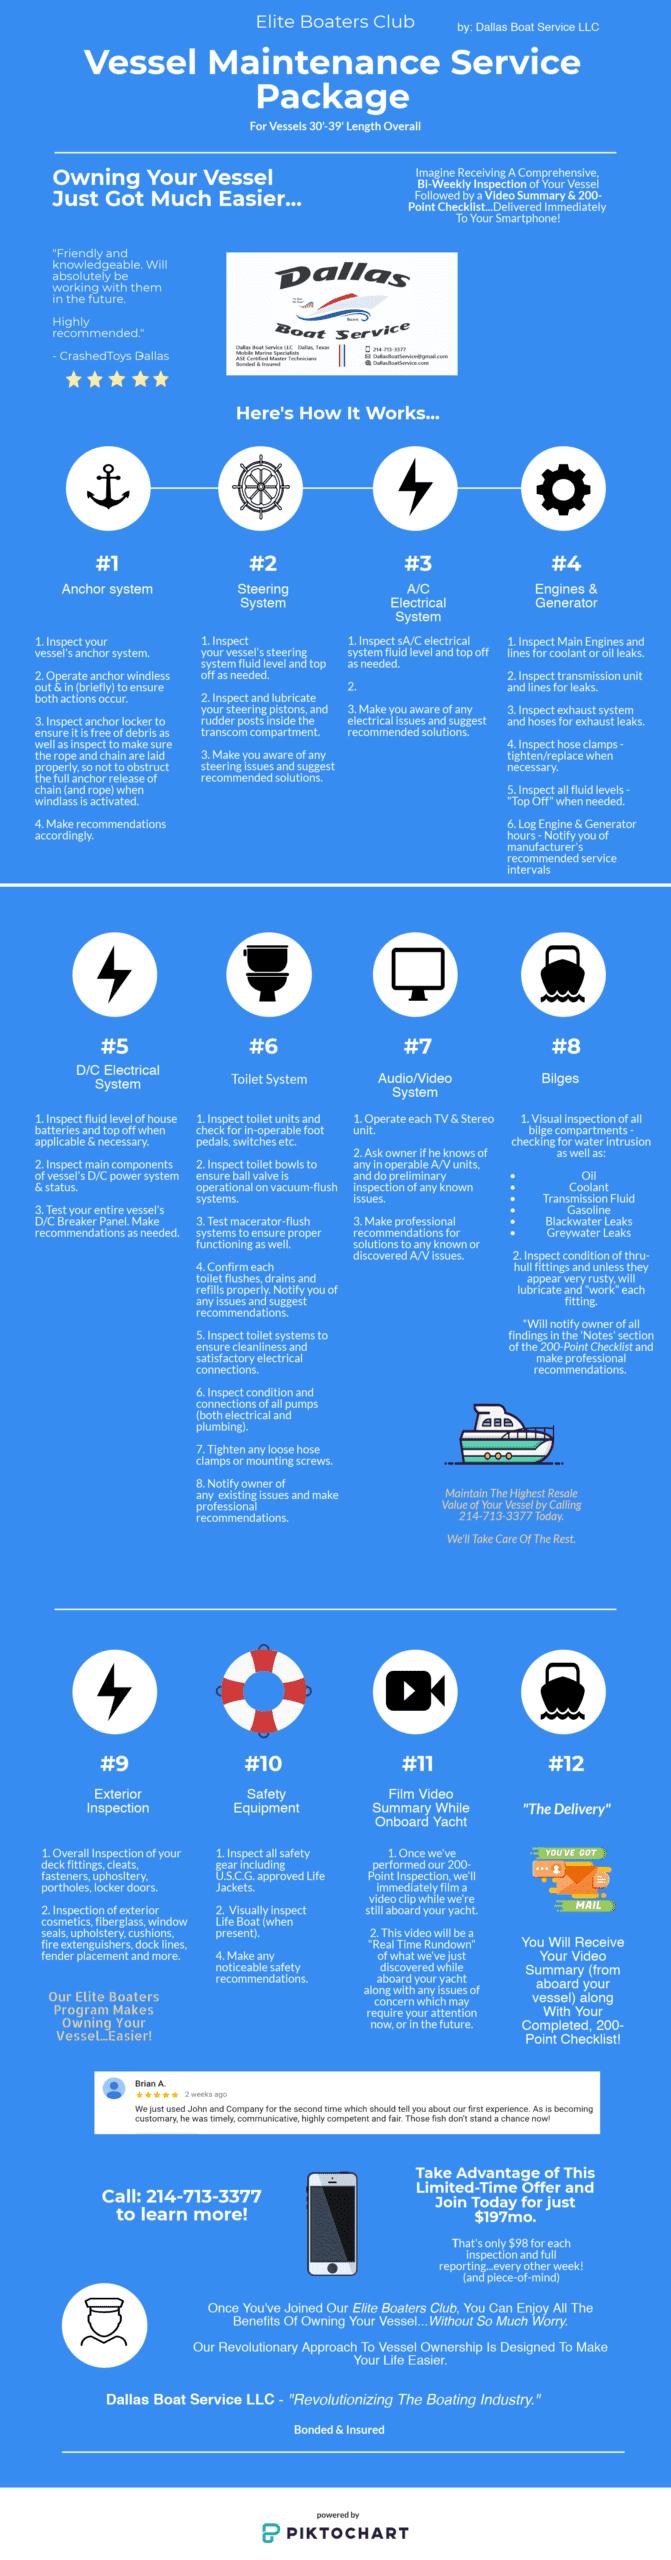 dallas-boat-service-package-2